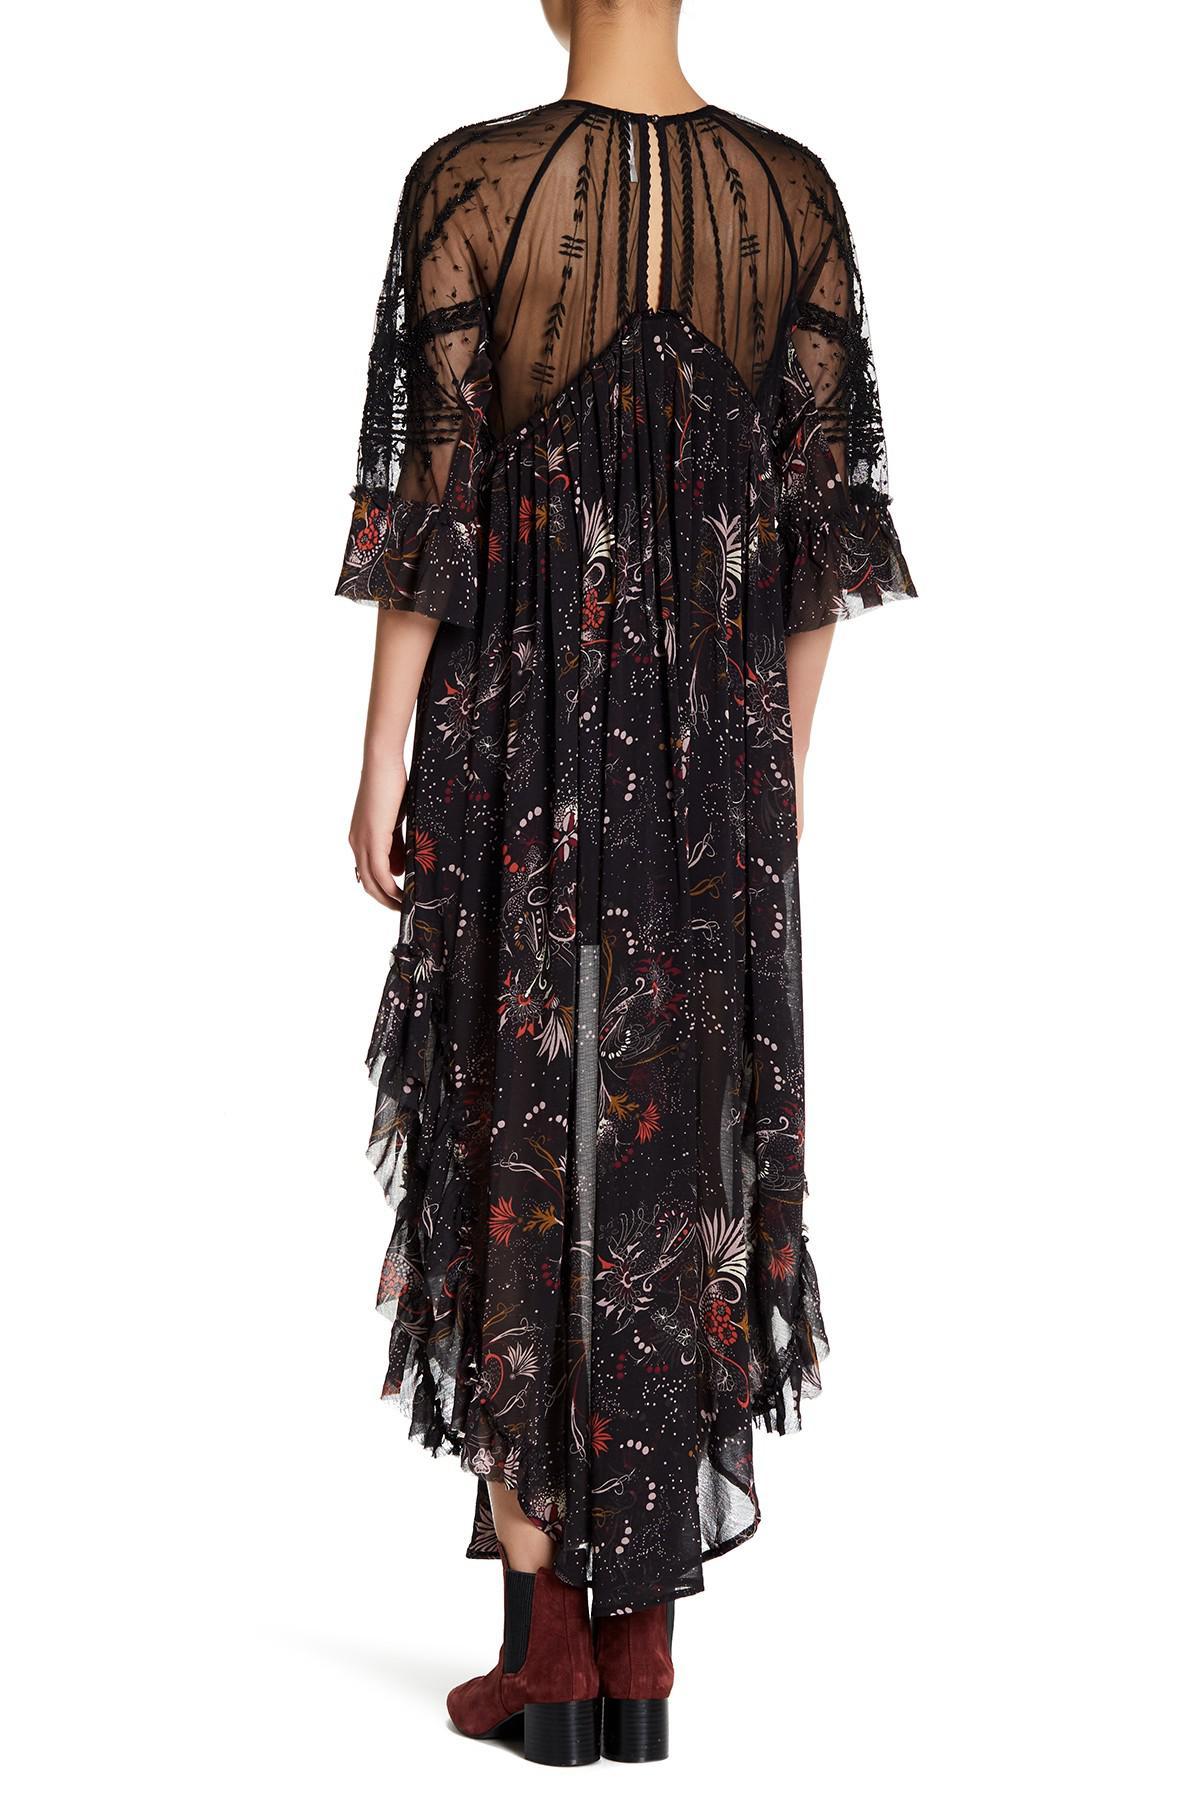 41b97dd175a59 Free People Spirit Of The Wild Maxi Dress in Black - Lyst